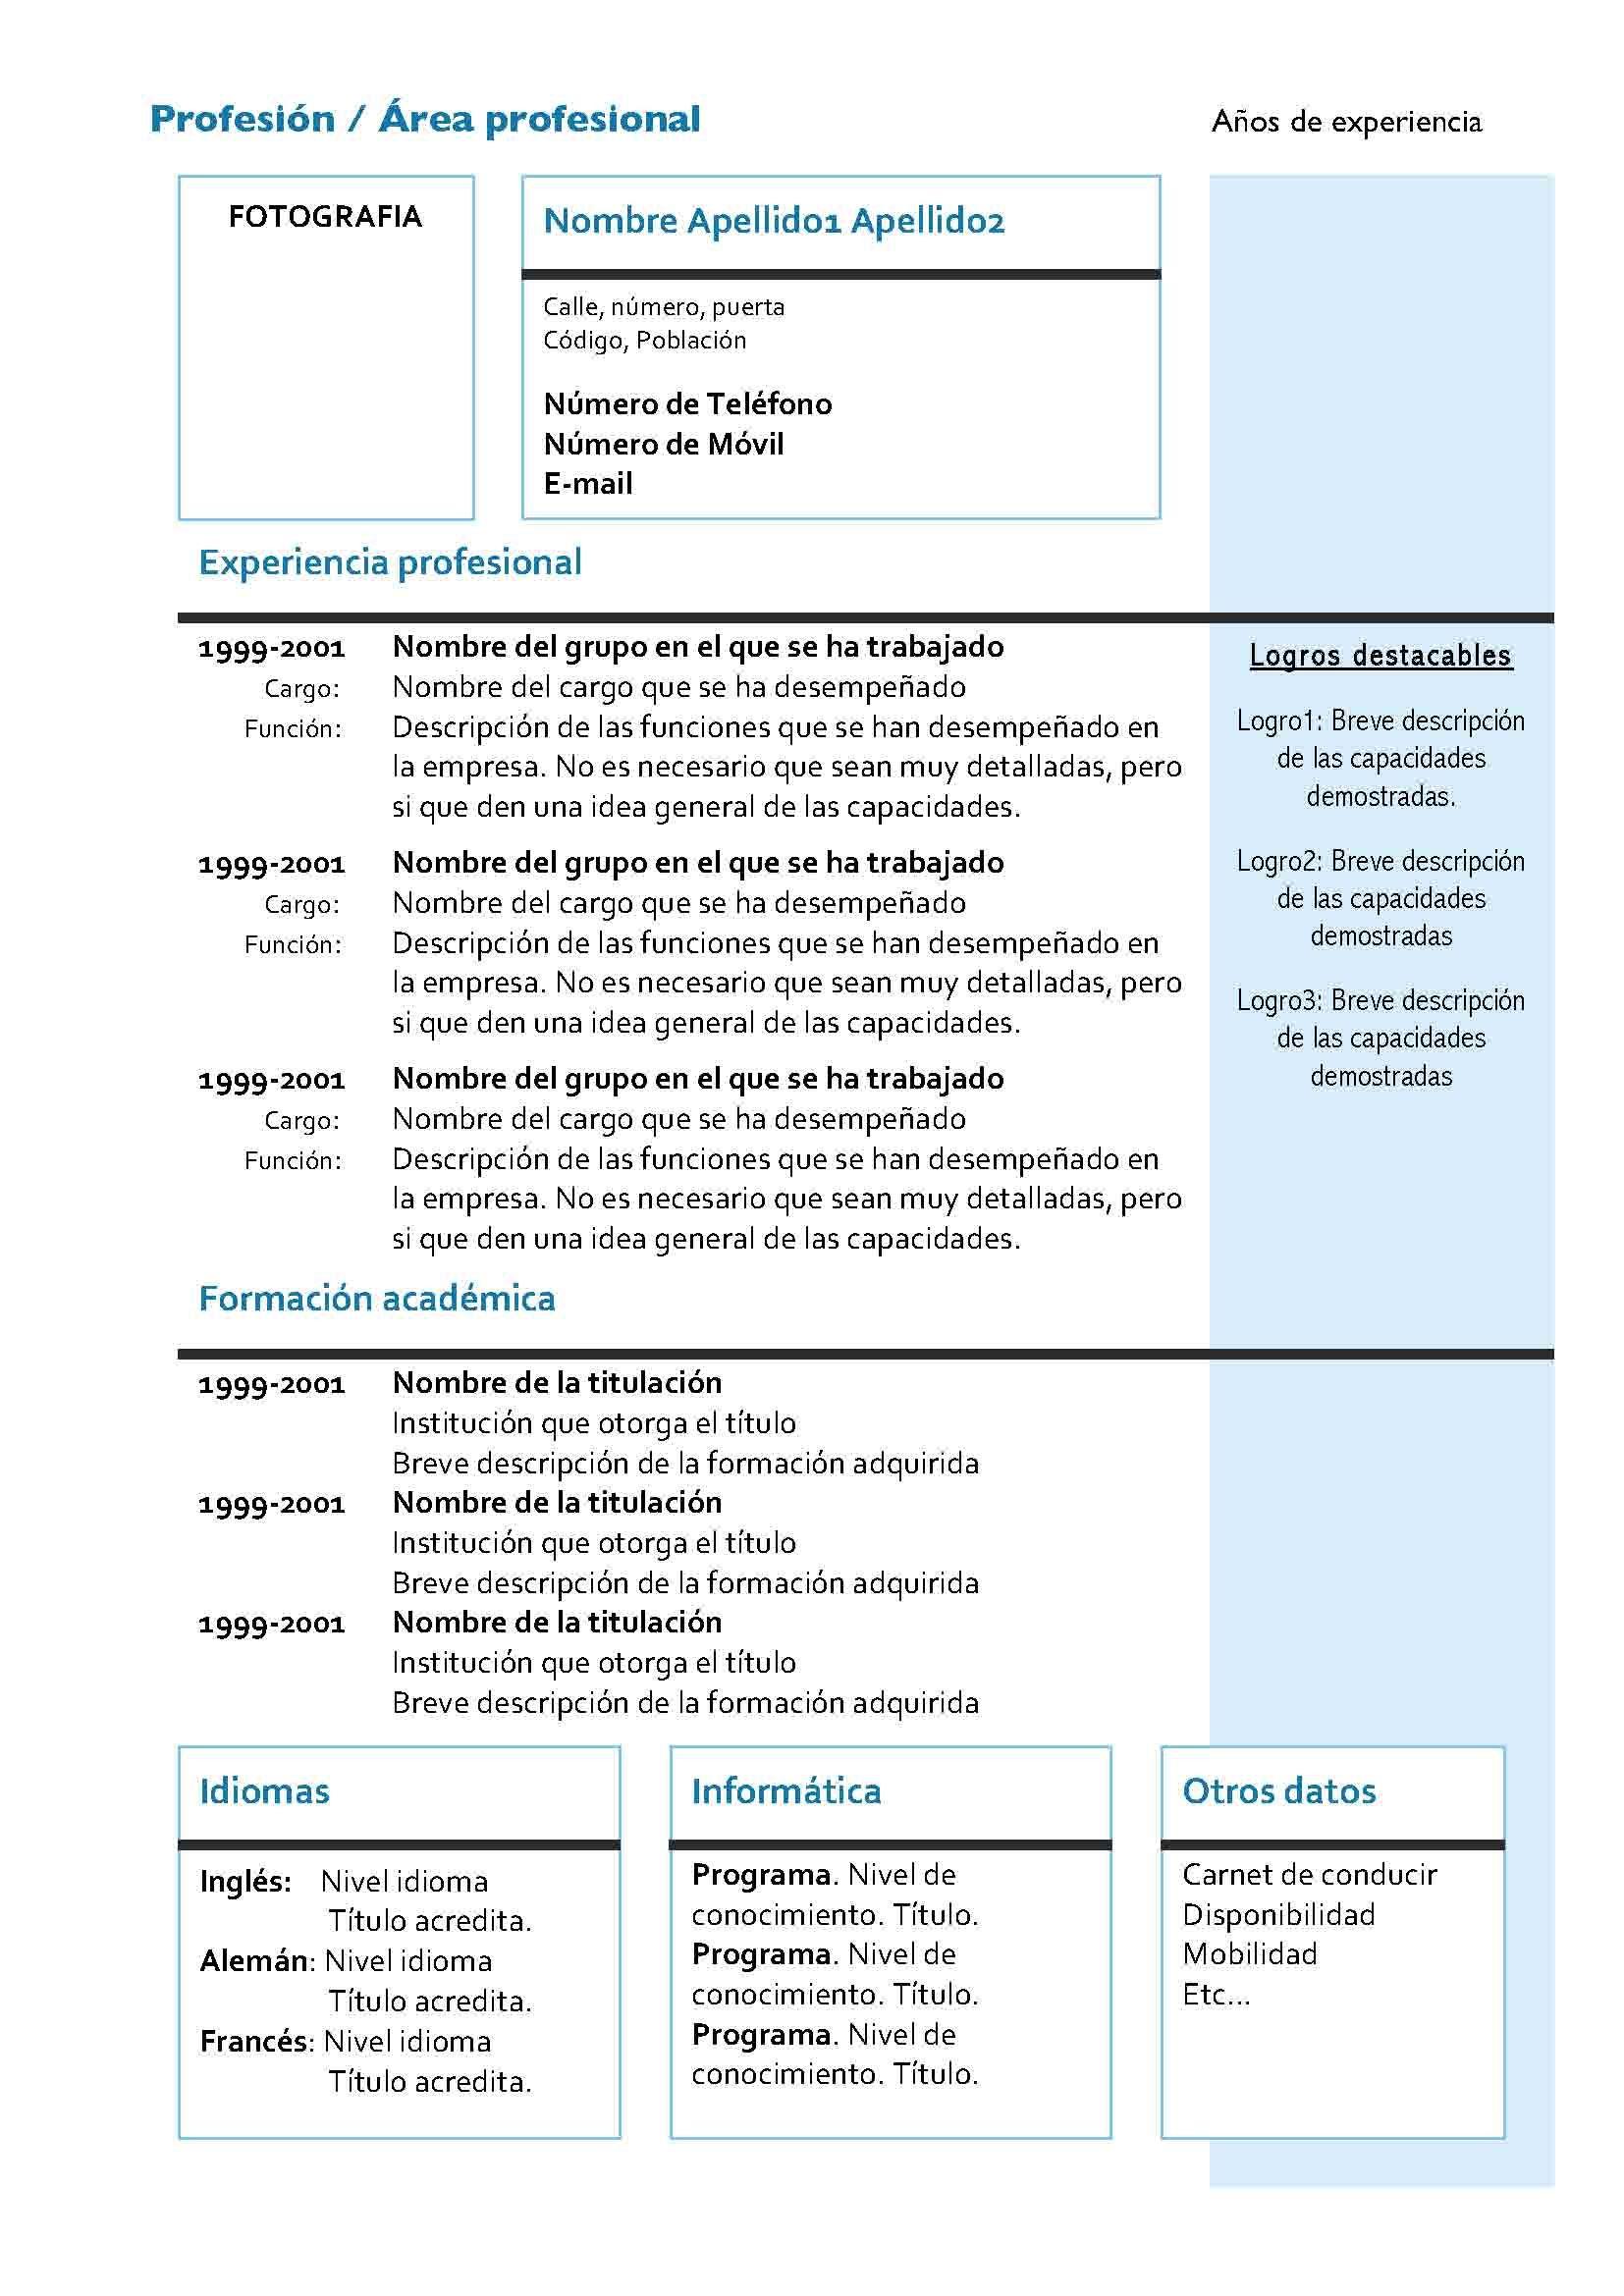 Como hacer un currículum vitae | estrategias pedagógicas | Pinterest ...